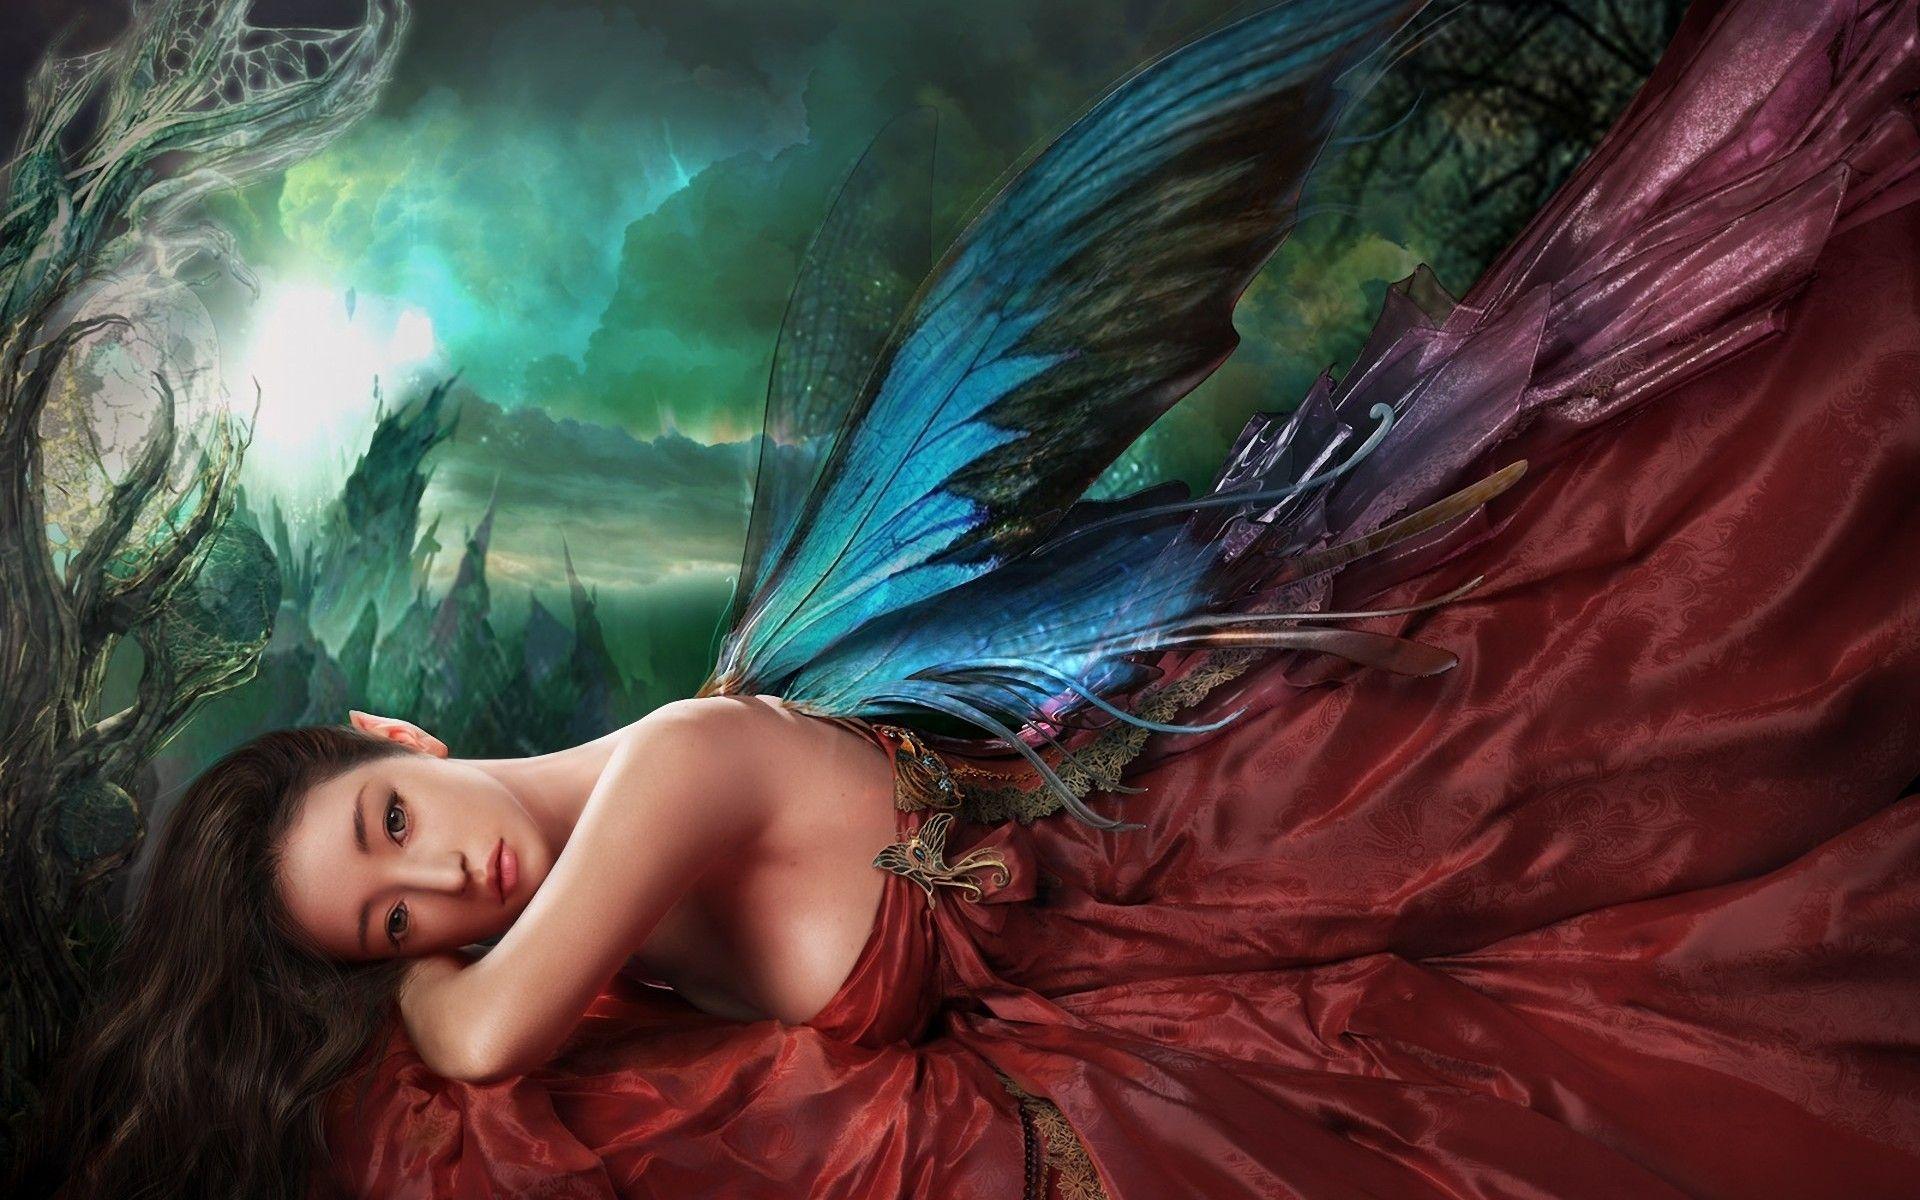 Fantastic Wallpaper Horse Fairy - 478023f2547466ebac6491b22b621ee0  2018_608434.jpg